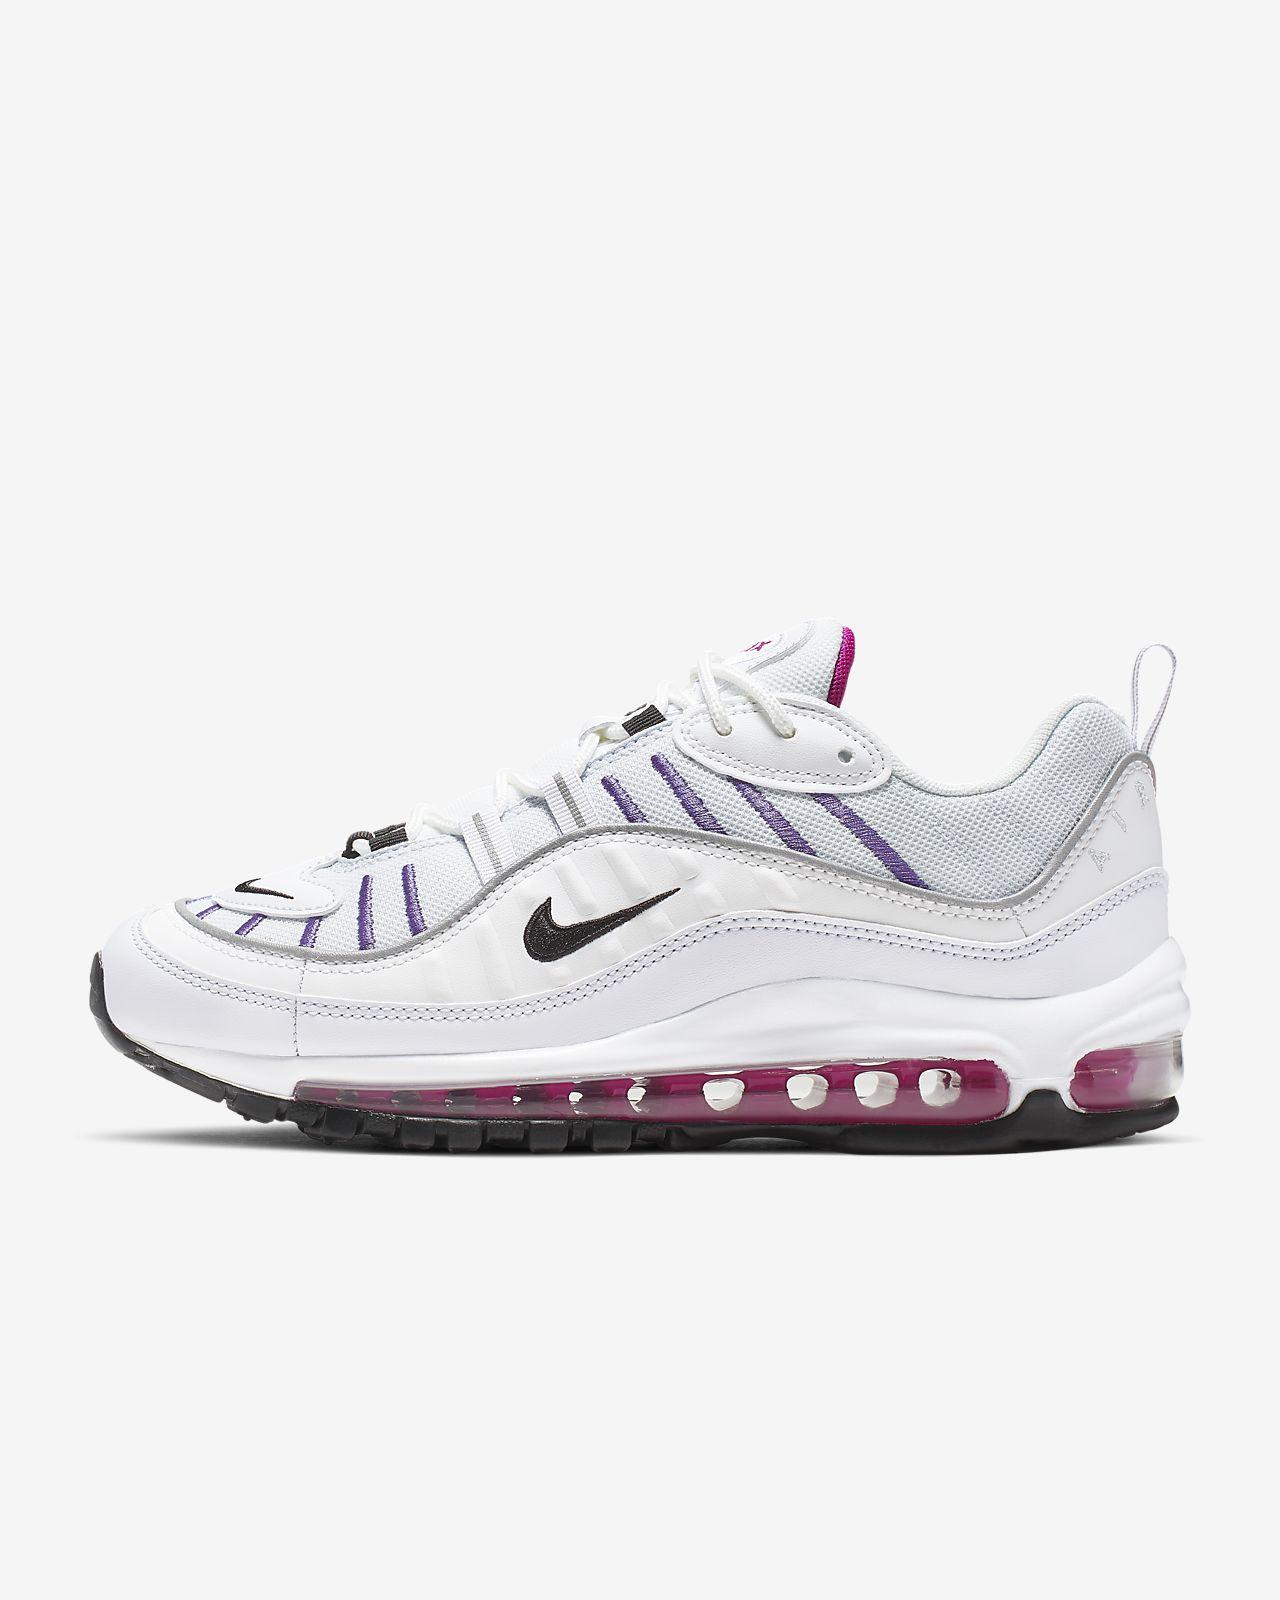 official photos 468f0 5e737 Nike Air Max 98 Women's Shoe